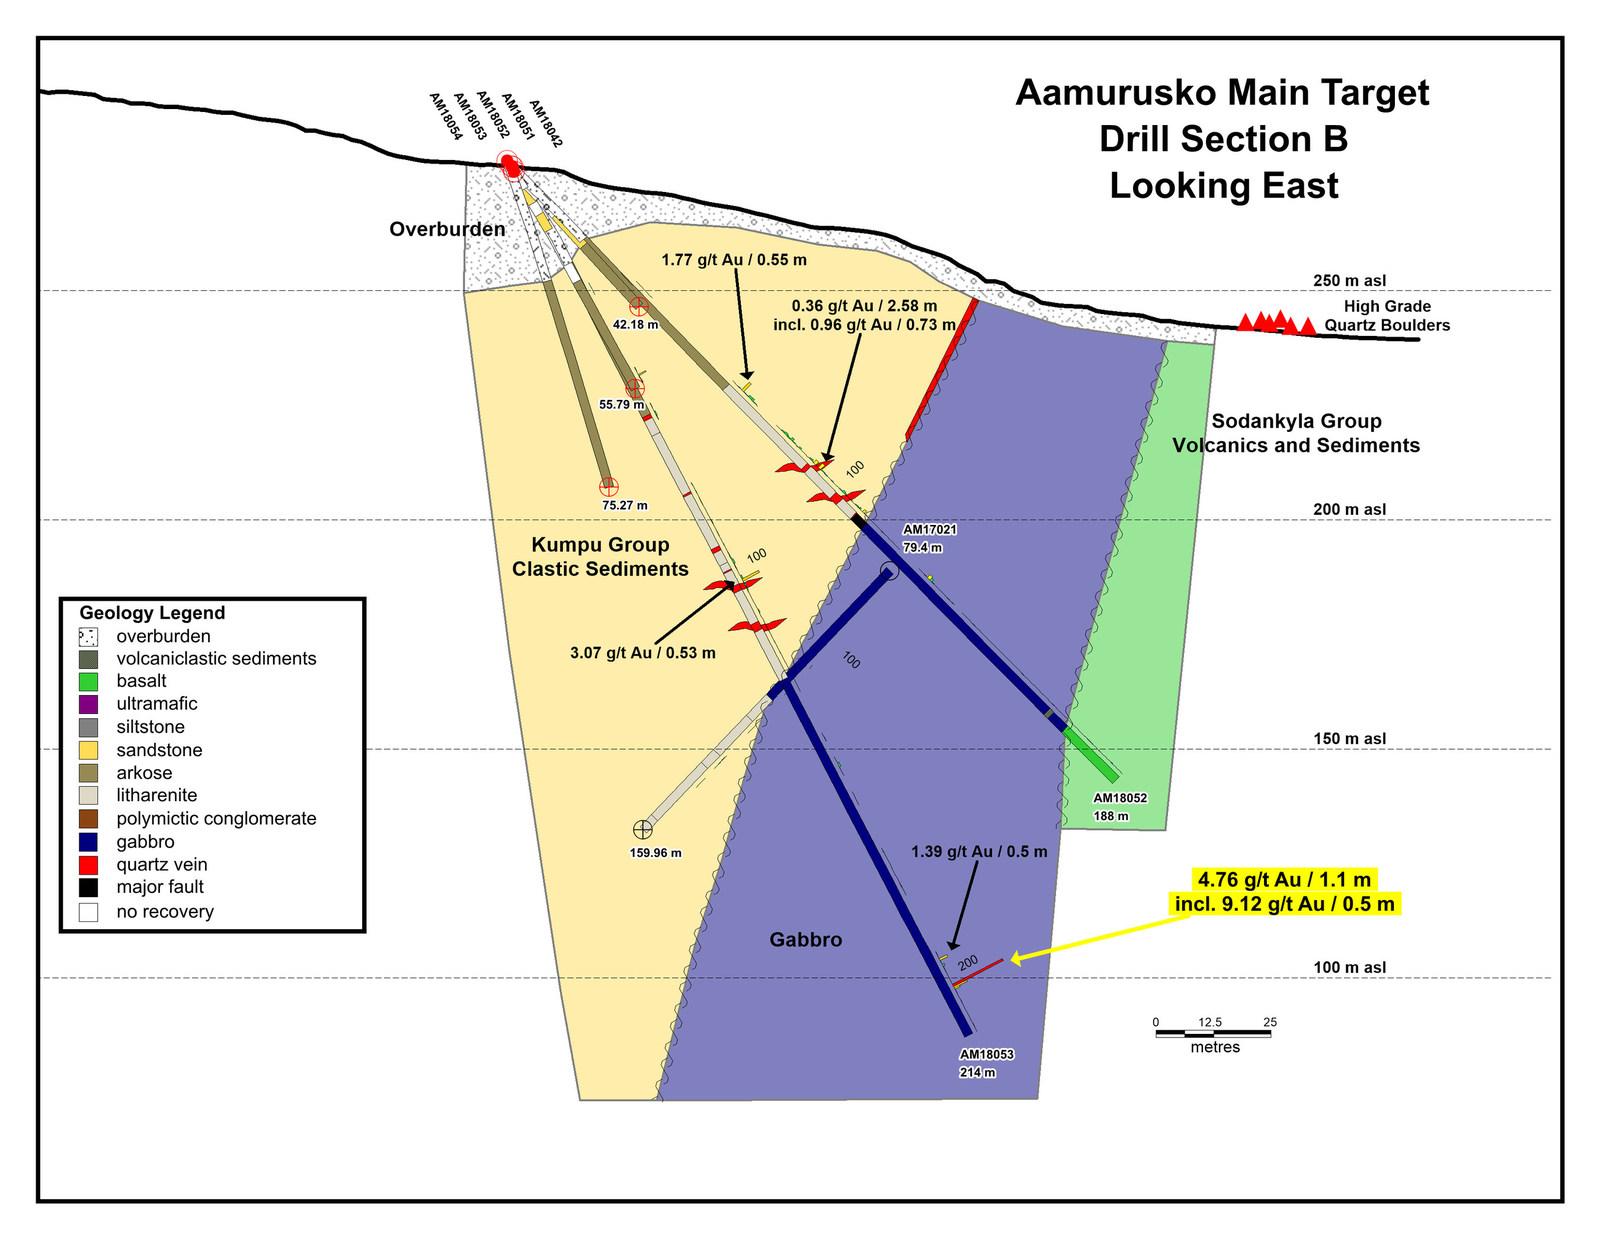 Aamurusko Main Target Drill Section B Looking East